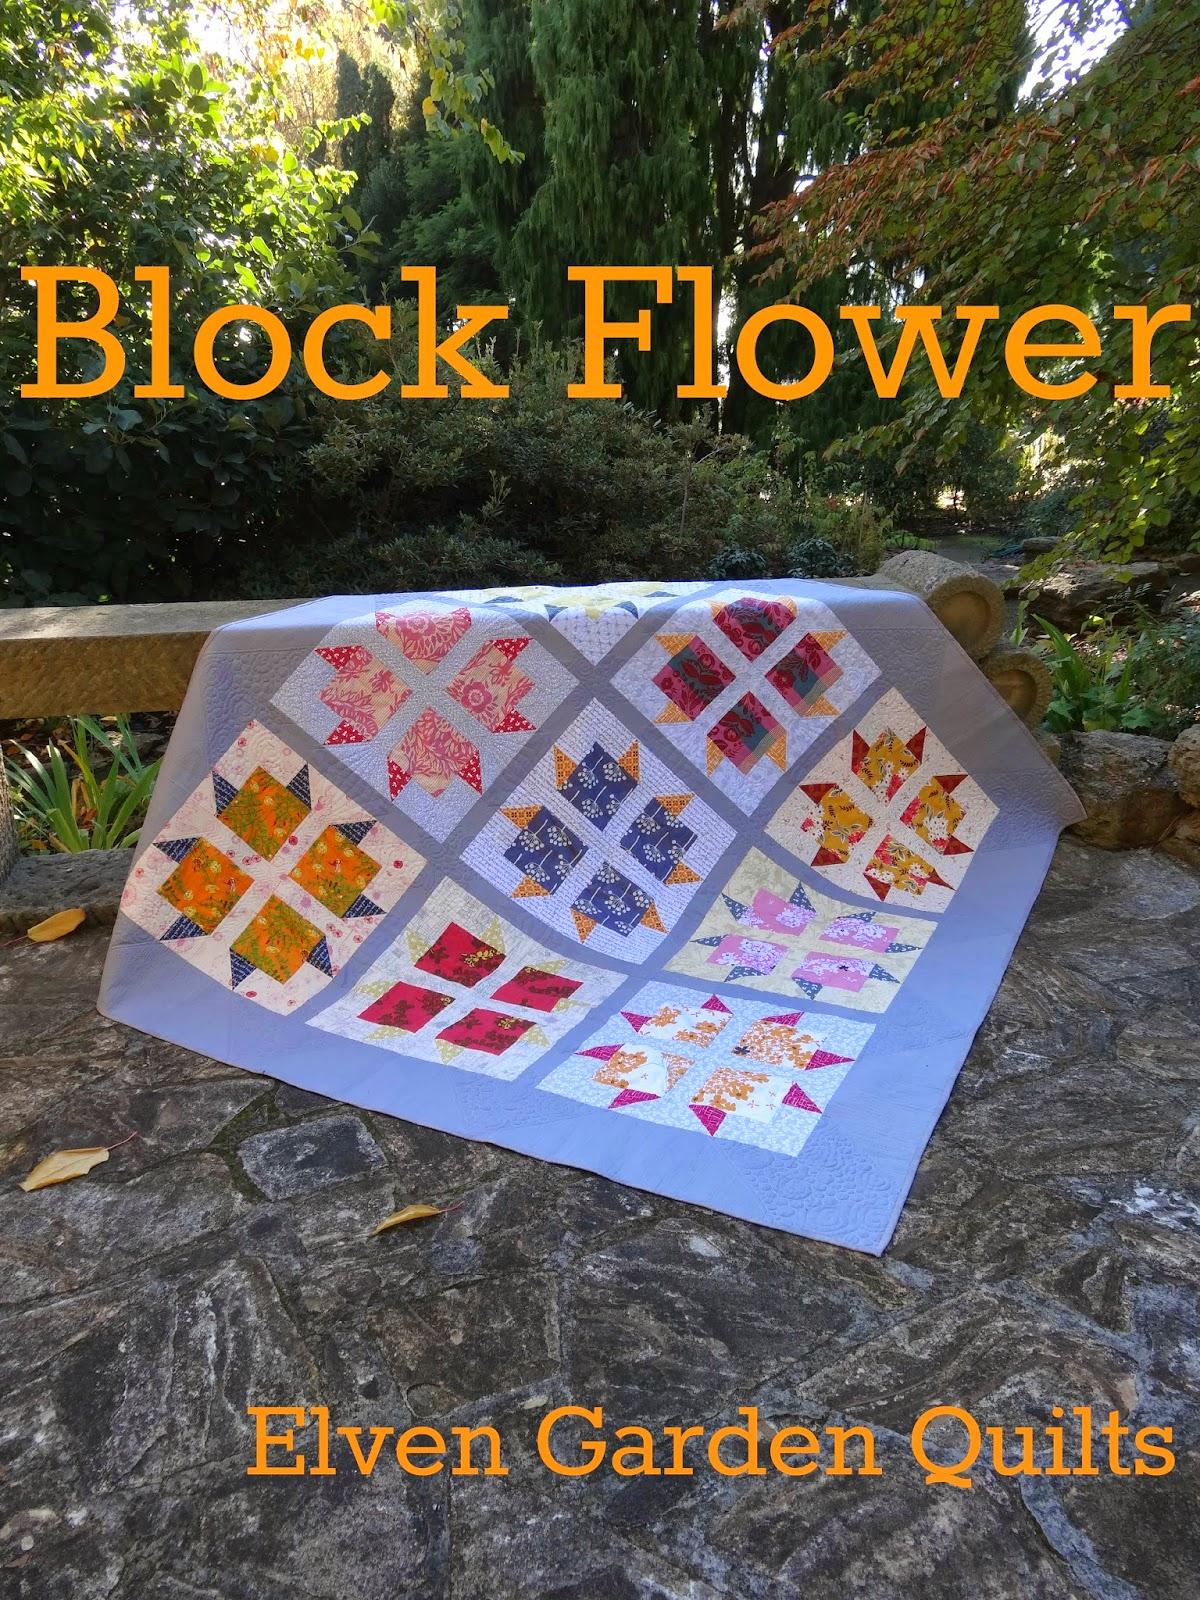 Elven Garden Quilts Block Flower Pattern Release And Giveaway